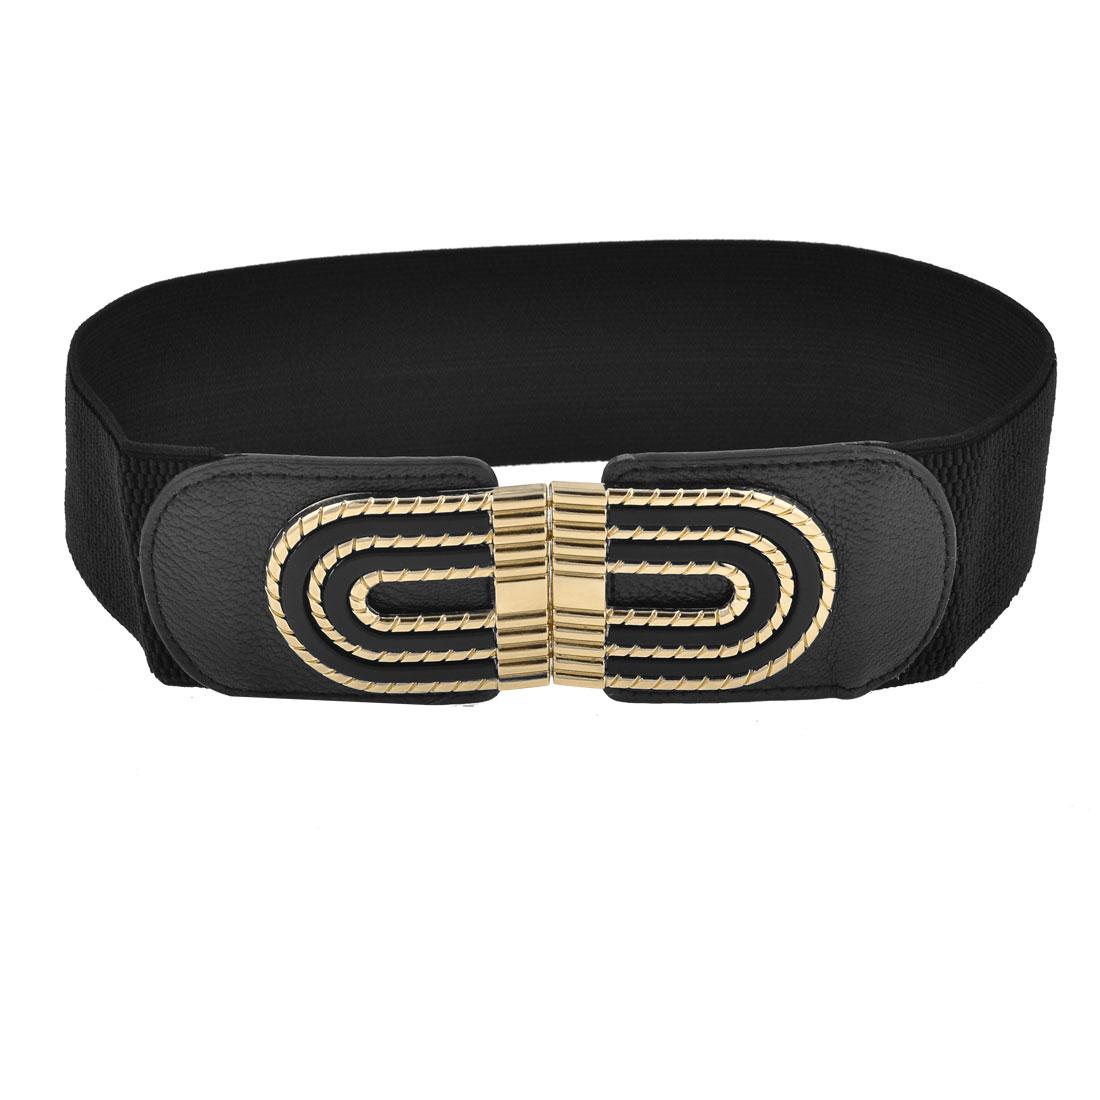 Black Elastic Band Arch Shape Interlocking Buckle Belt for Girls